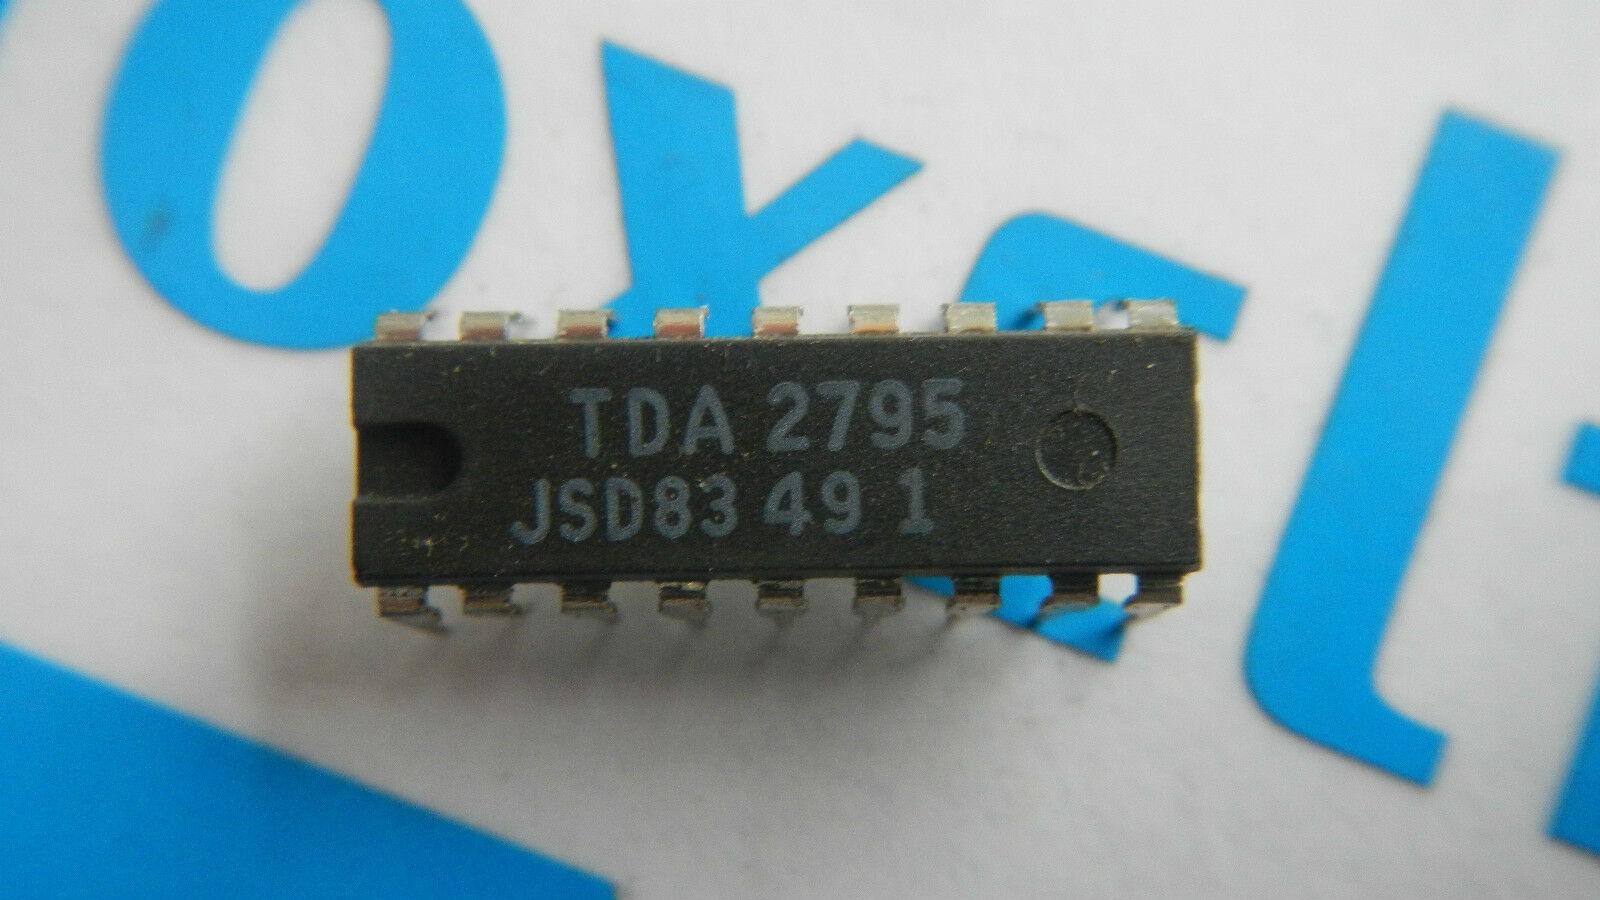 TDA 4605-15 CIRCUITO INTEGRATO TDA460515